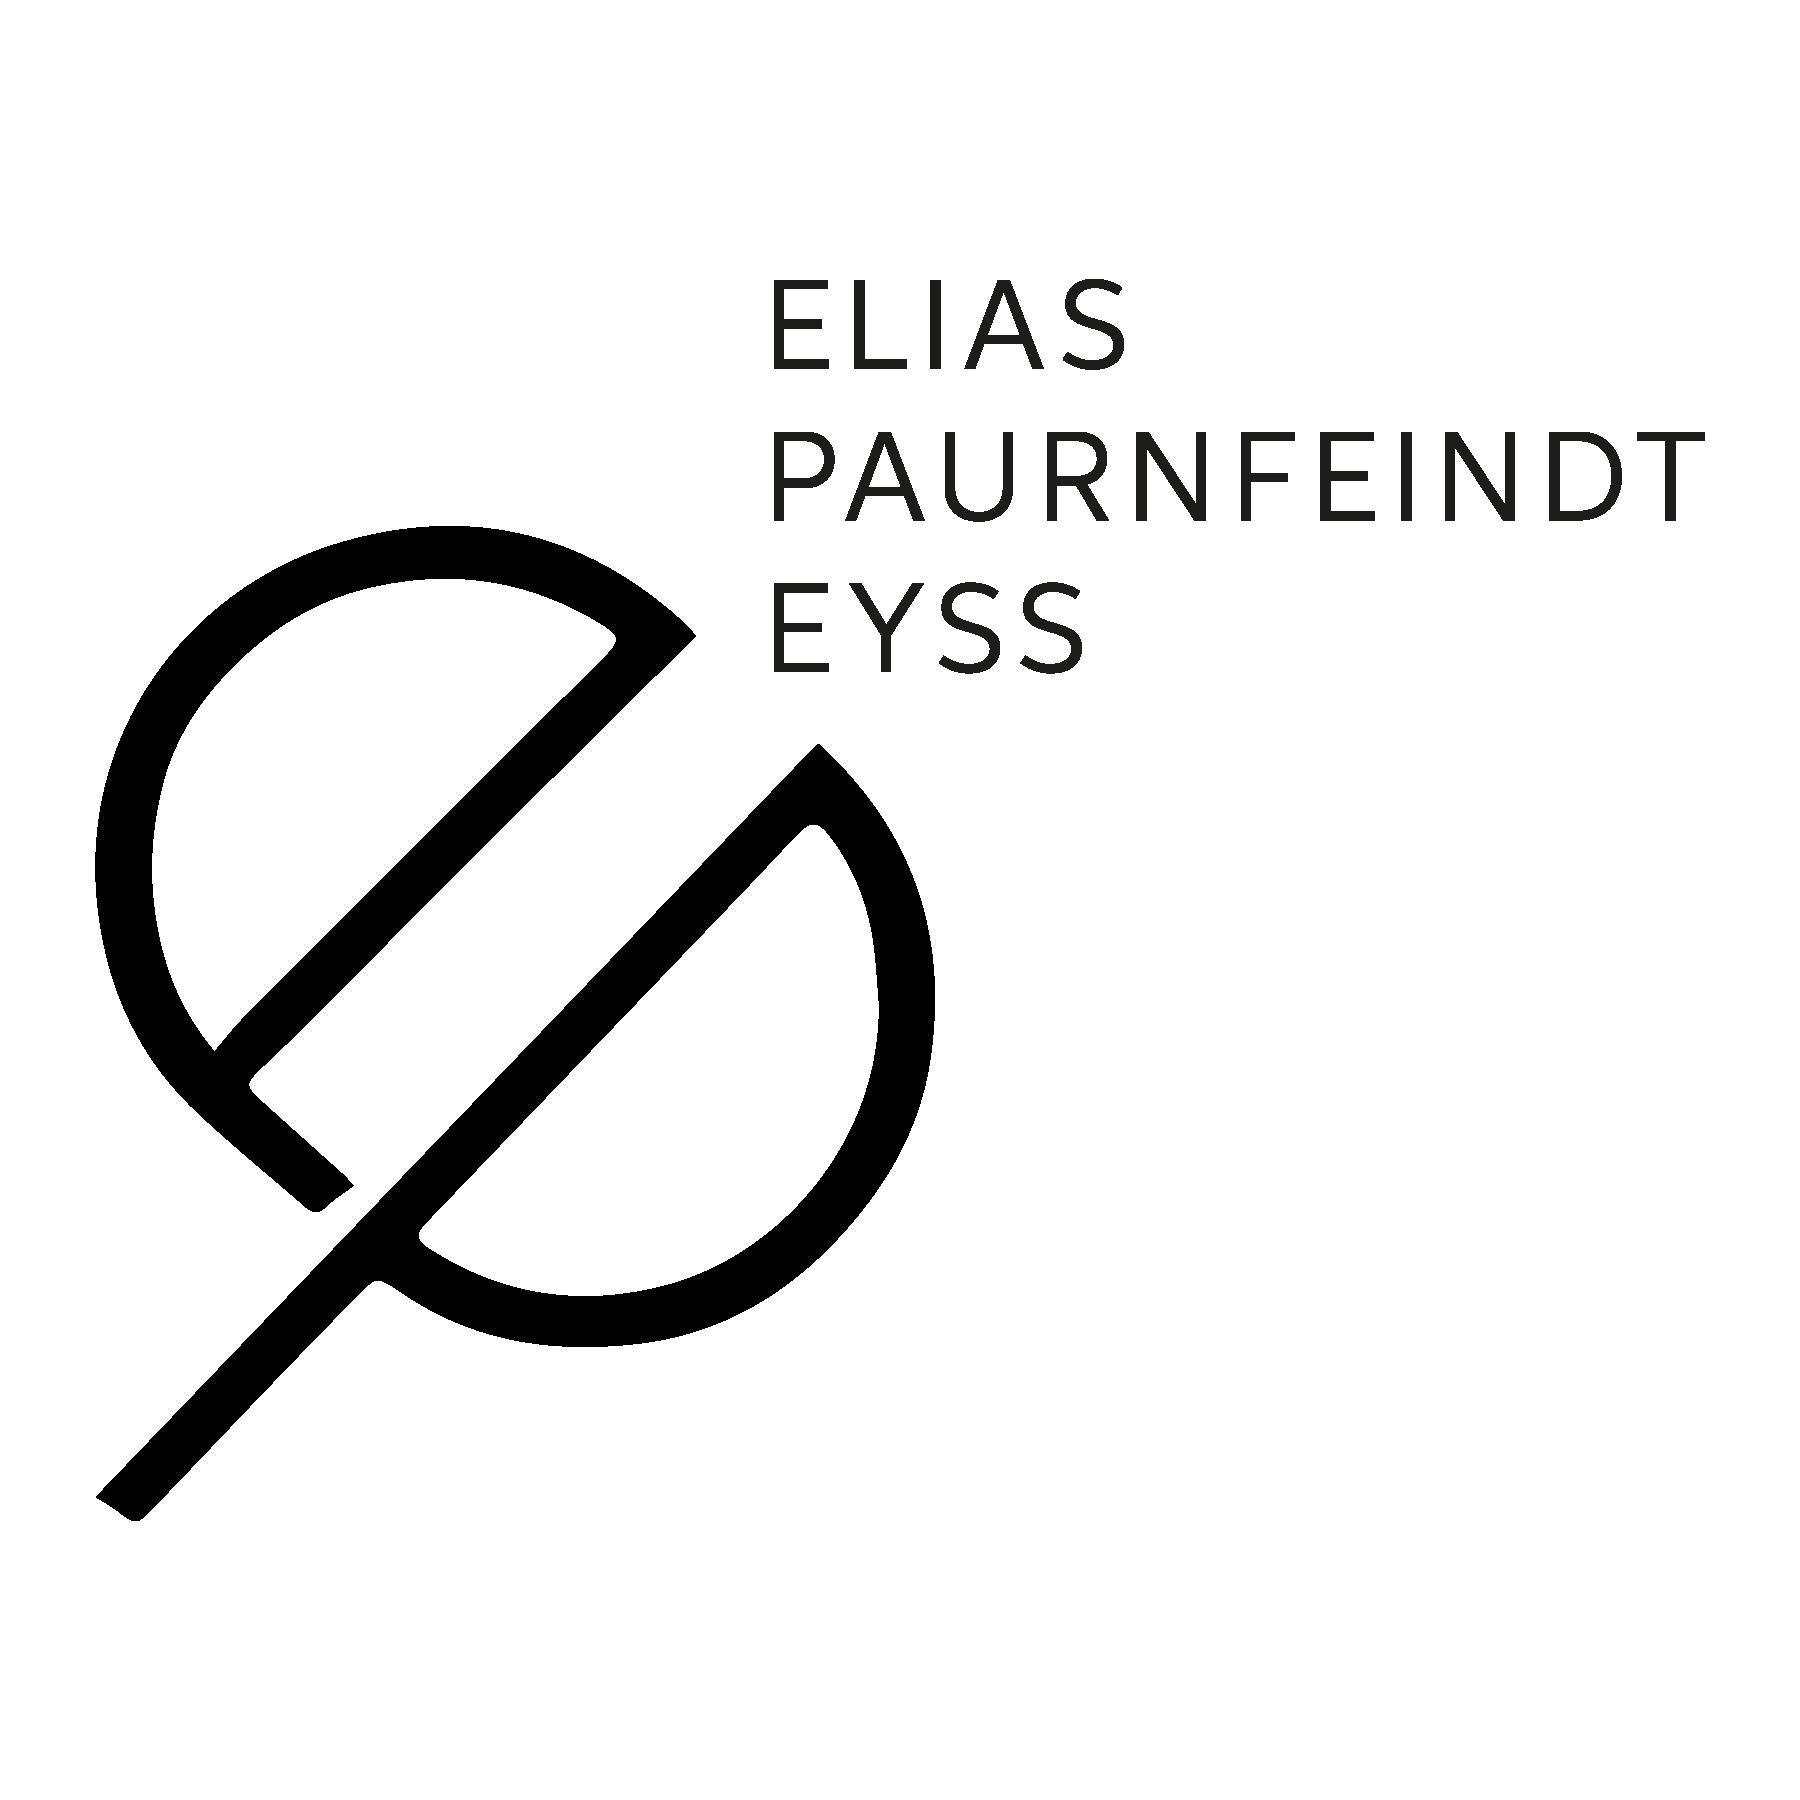 Elias Paurnfeindt-Eyss